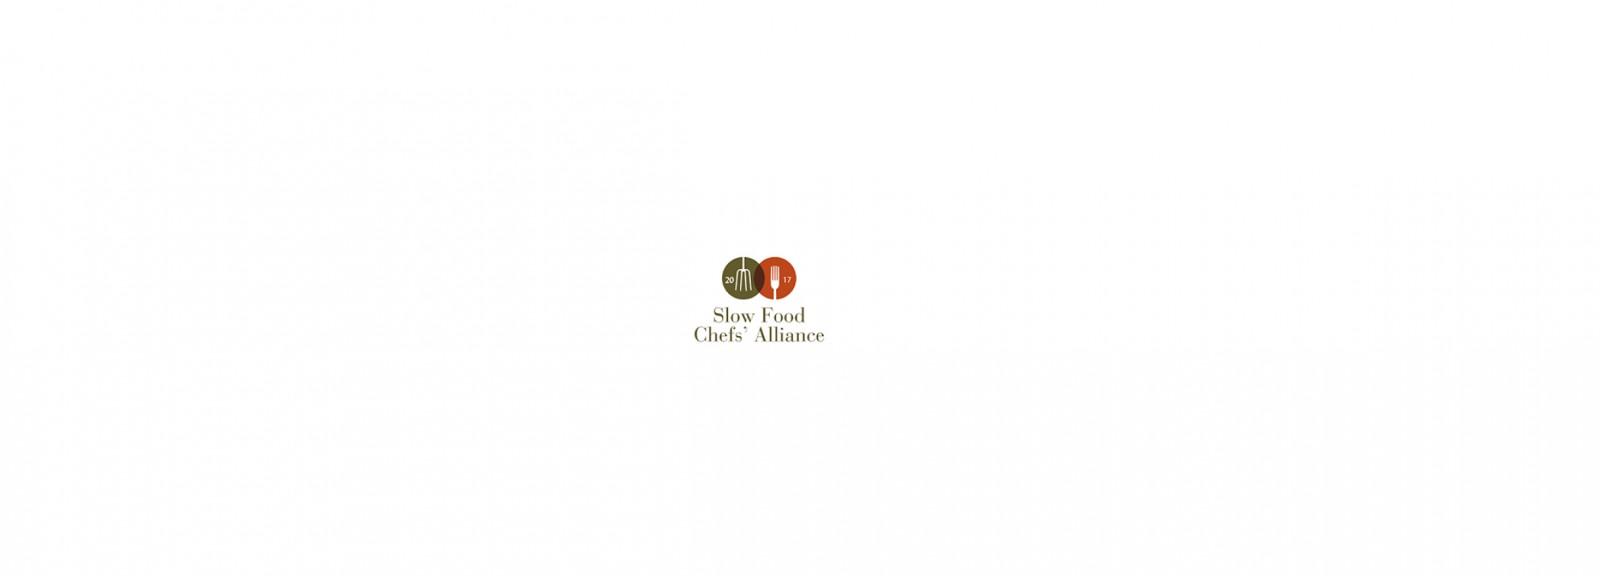 Slow Food International Press Release: Slow Food Chefs' Alliance in the UK joins international network